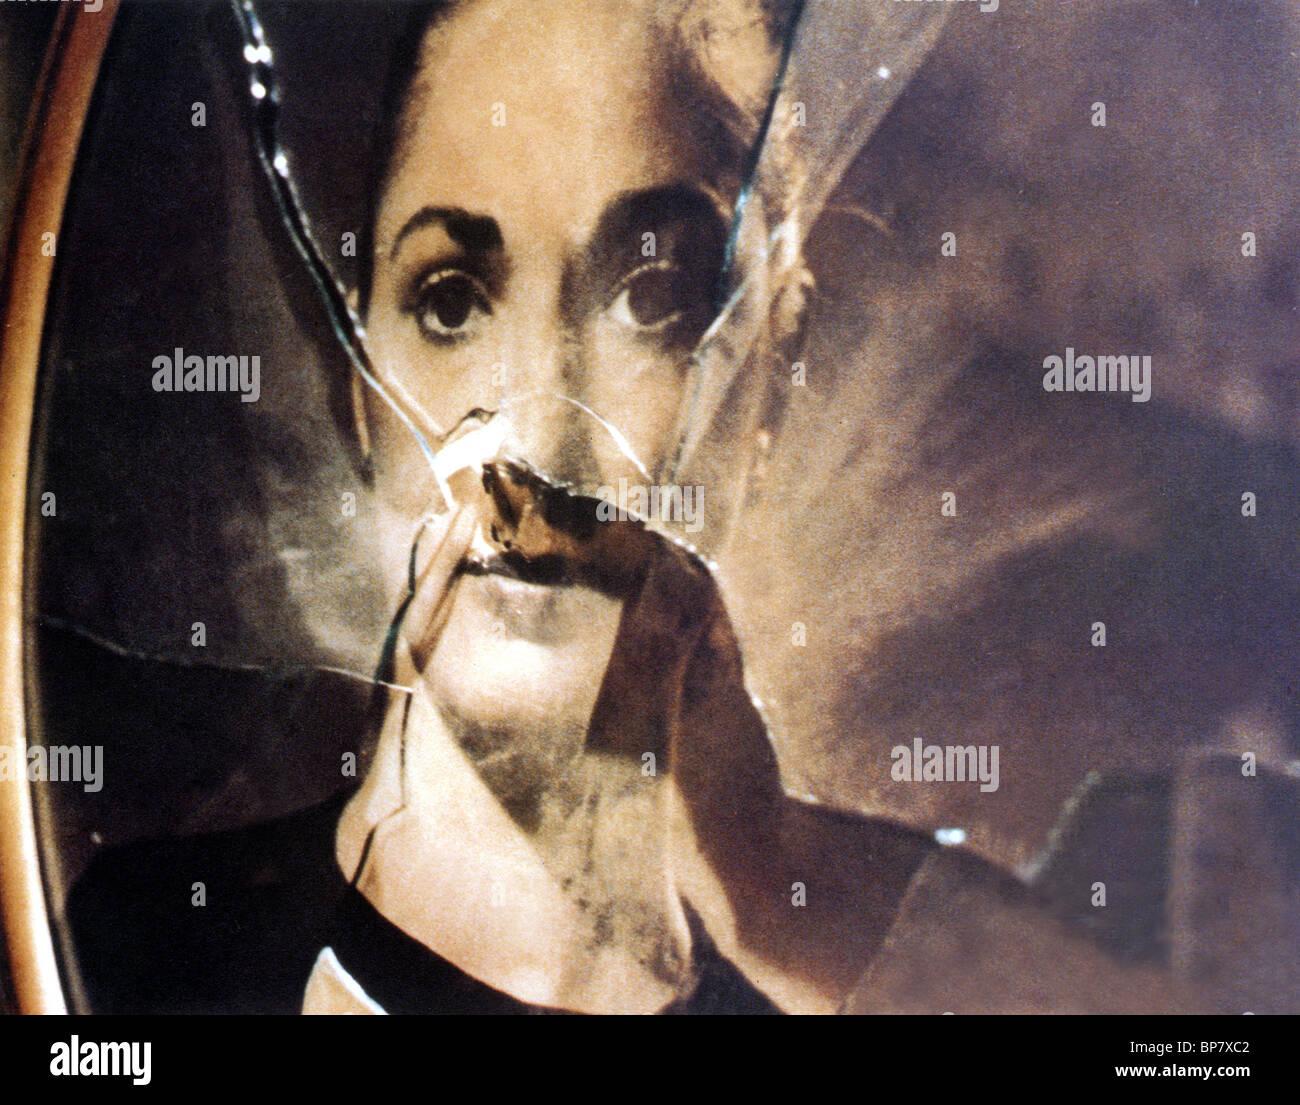 BARBARA STEELE THE SILENT SCREAM (1980) - Stock Image